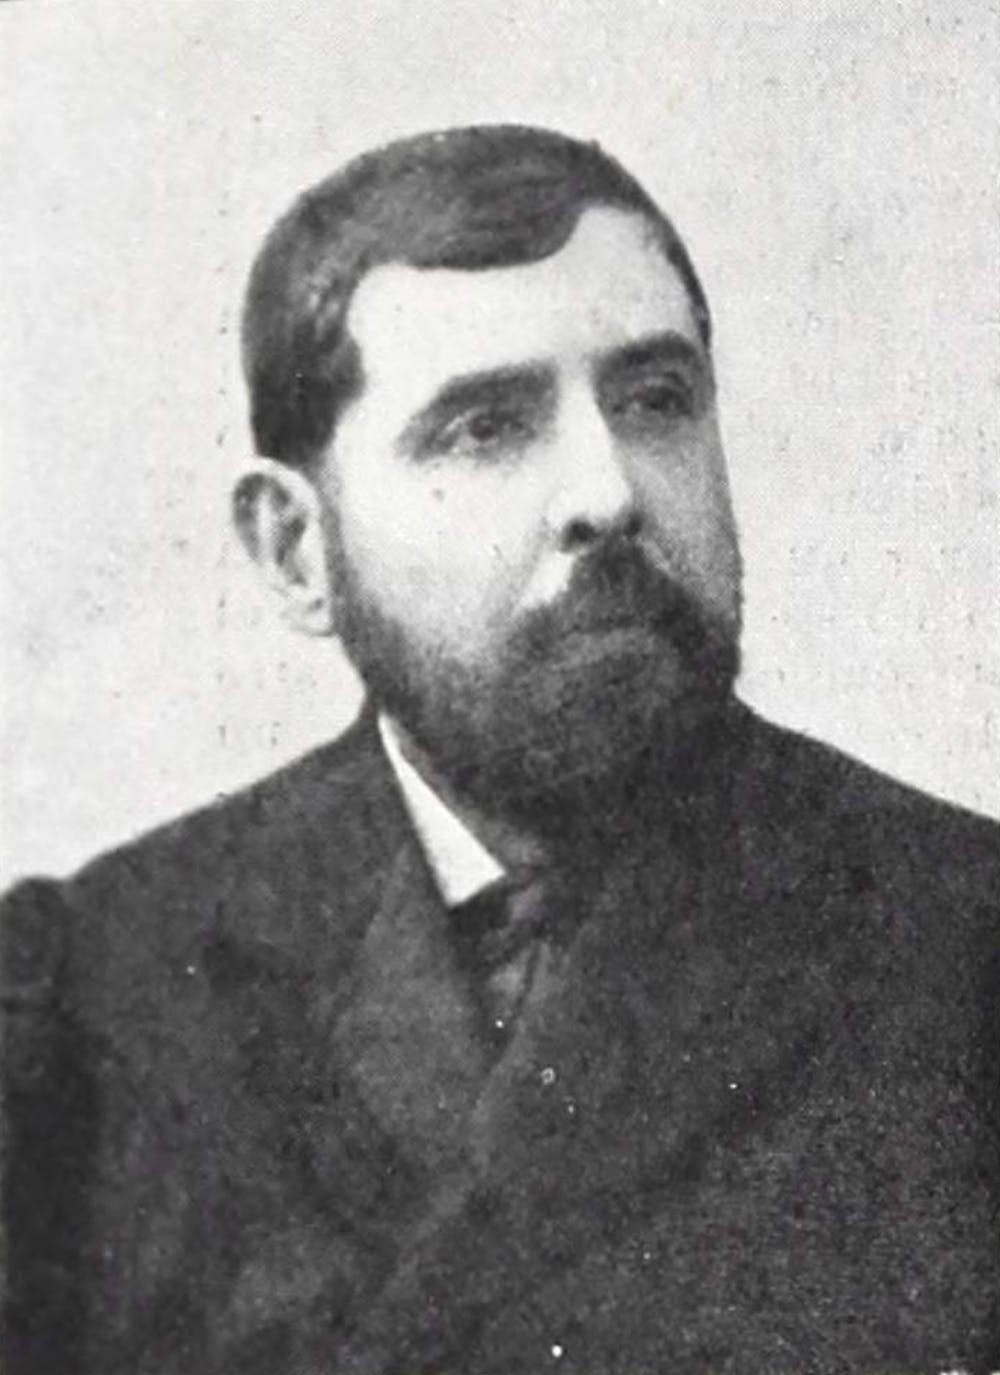 José Gómez Ocaña. Wikipedia